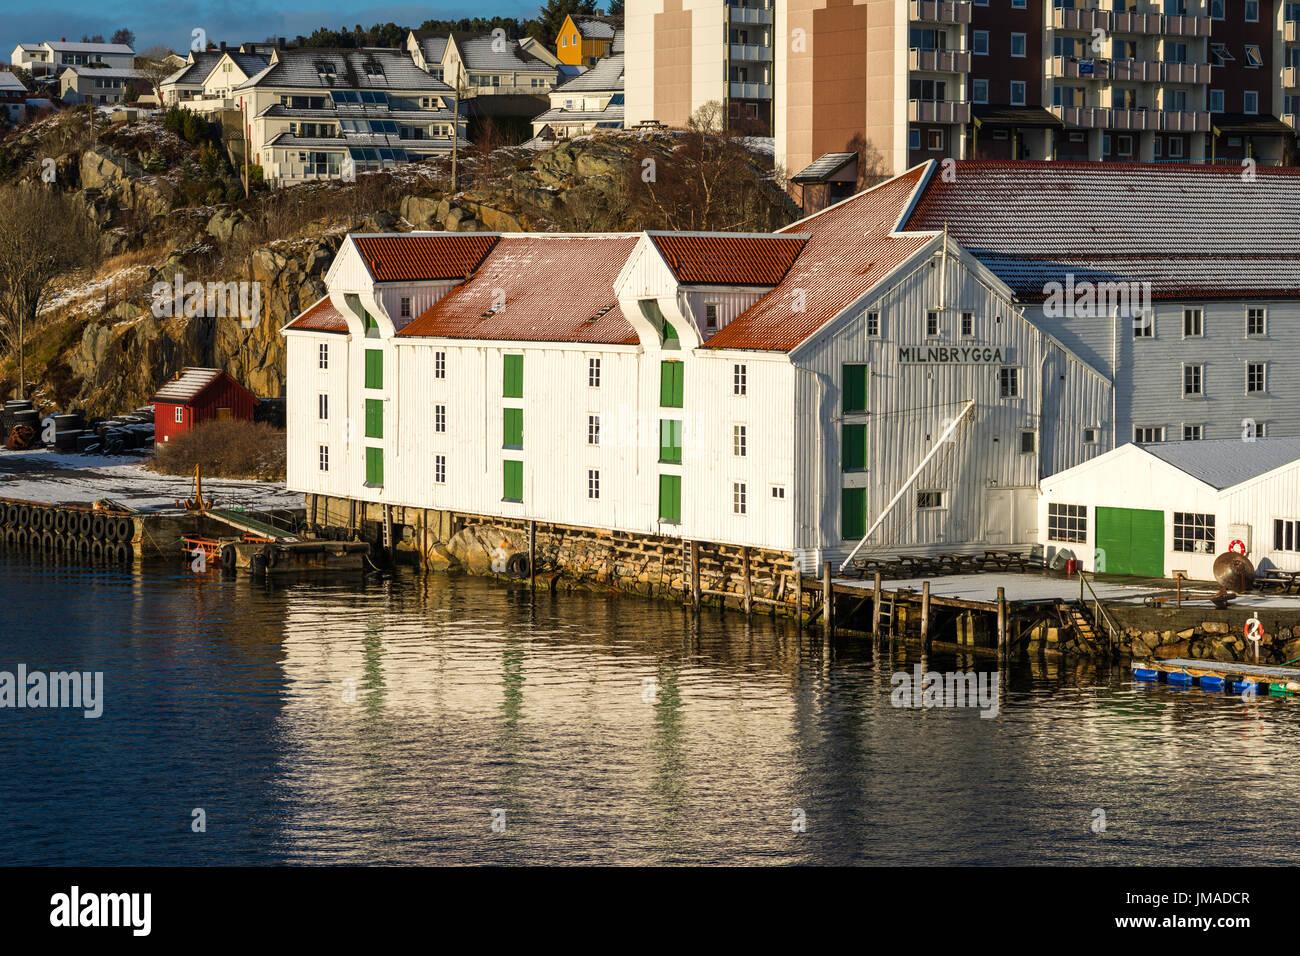 Dockside wooden warehouses on the island of Kirkelandet, the harbour district of Kristiansund, Møre og Romsdal, Norway. - Stock Image